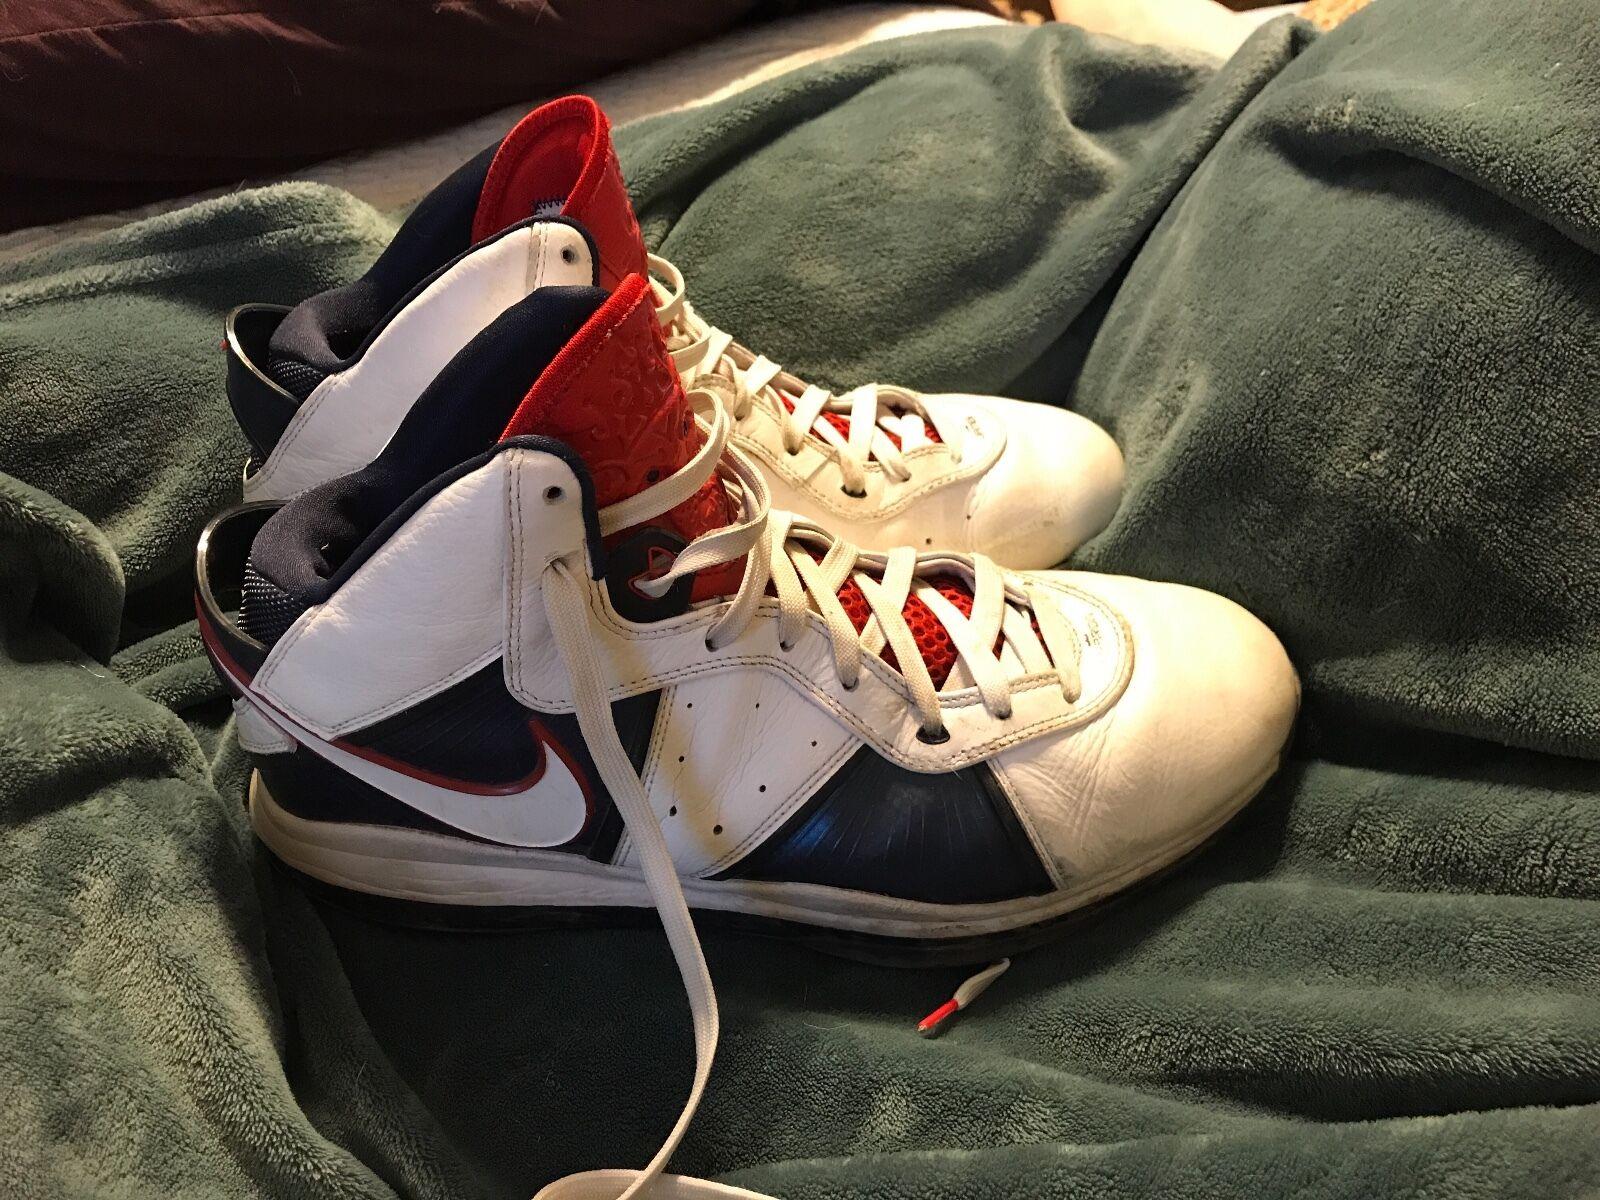 Nike Lebron VIII 8 White/White-Midnight Navy- Red USA 2018 417098-100 Price reduction